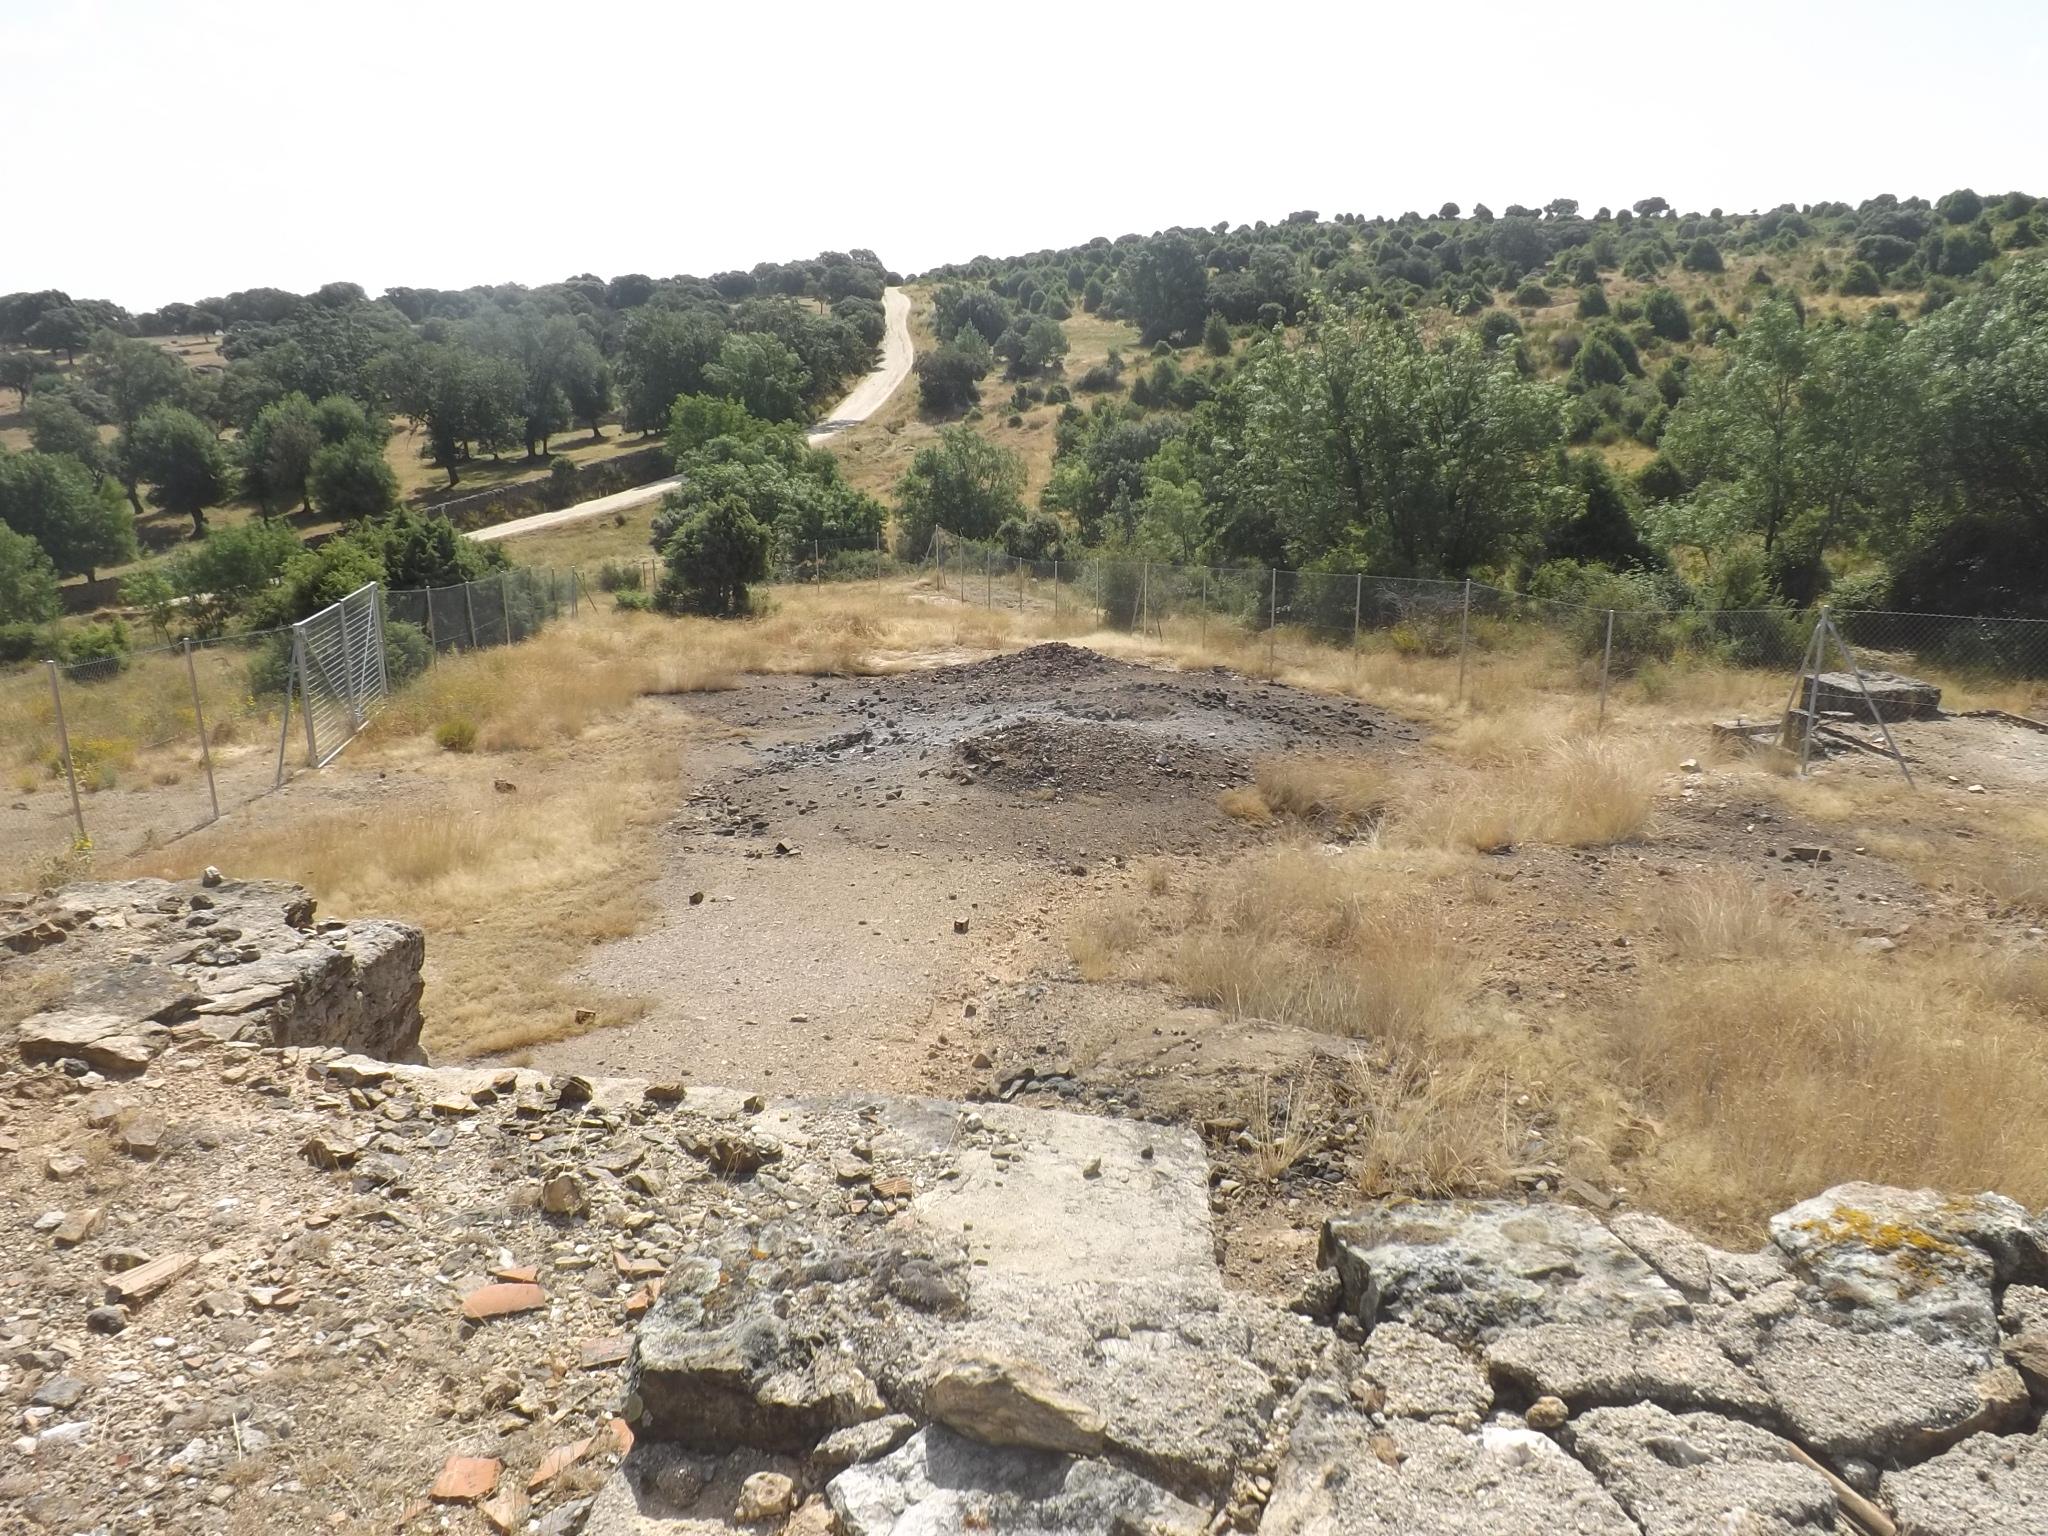 Mina arsenico Sierra de Madrid